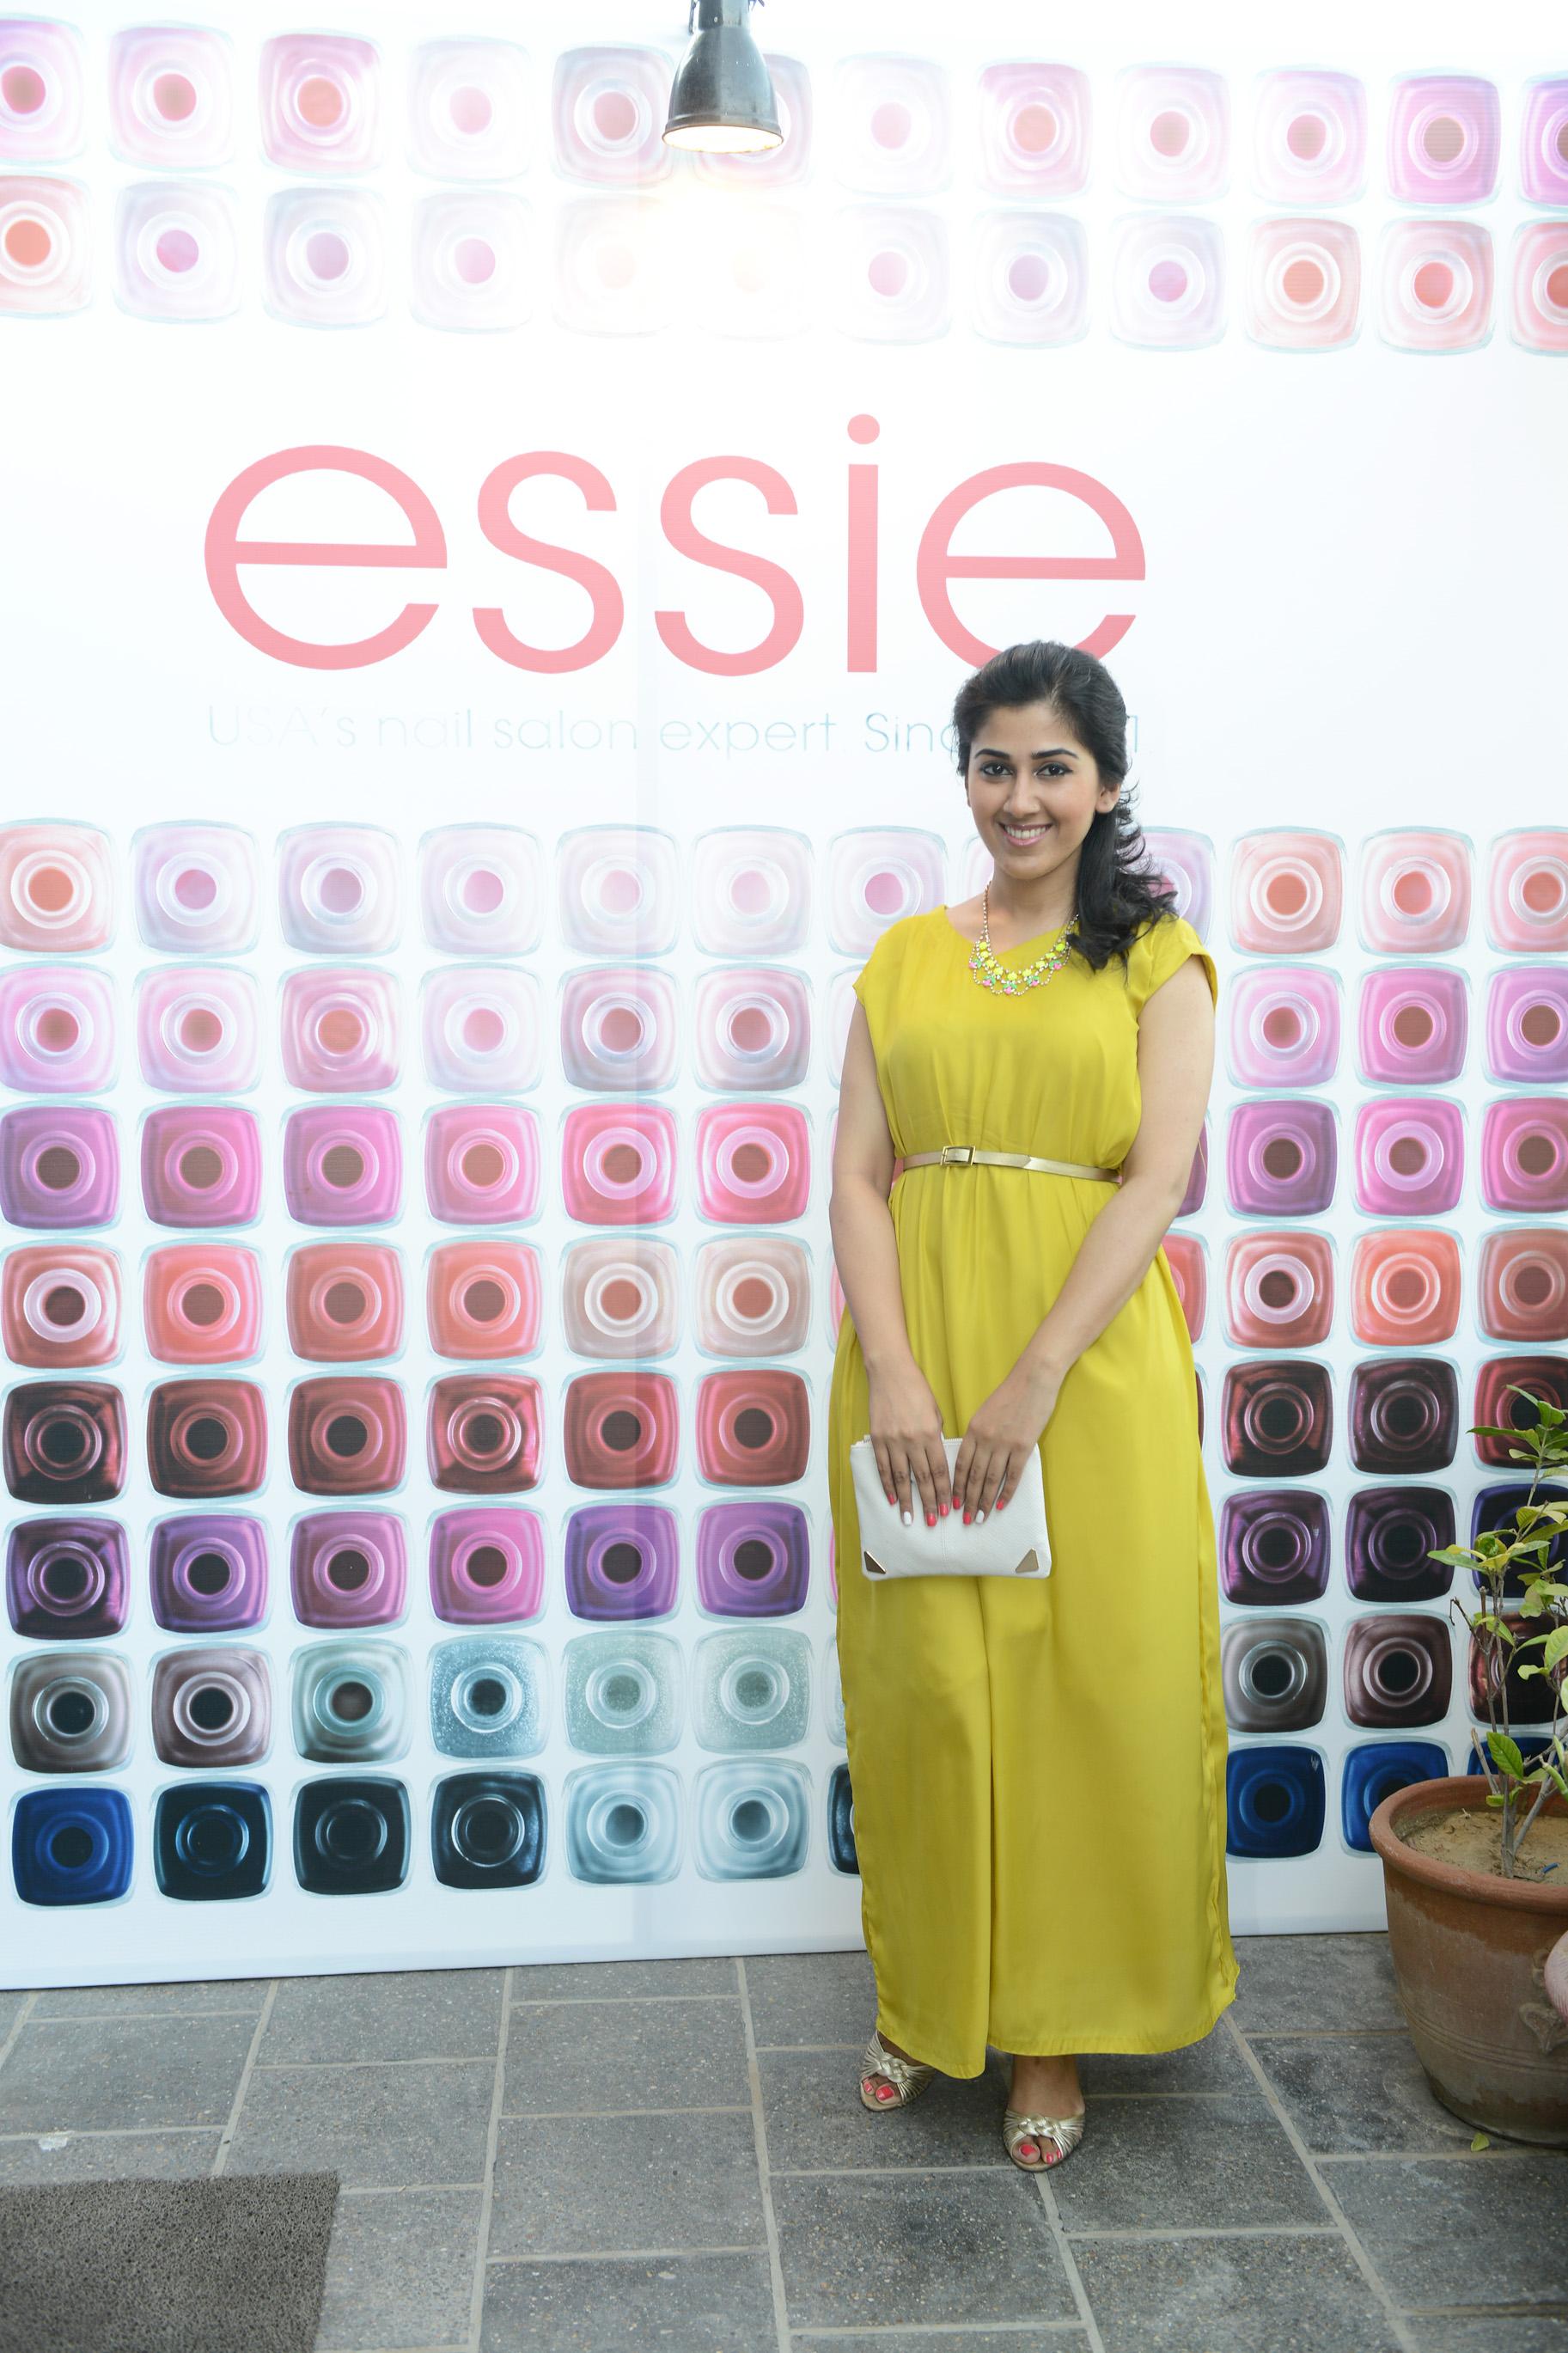 Ht most mumbai stylish awards winners, Eva launch to longoria new evamour fragrance